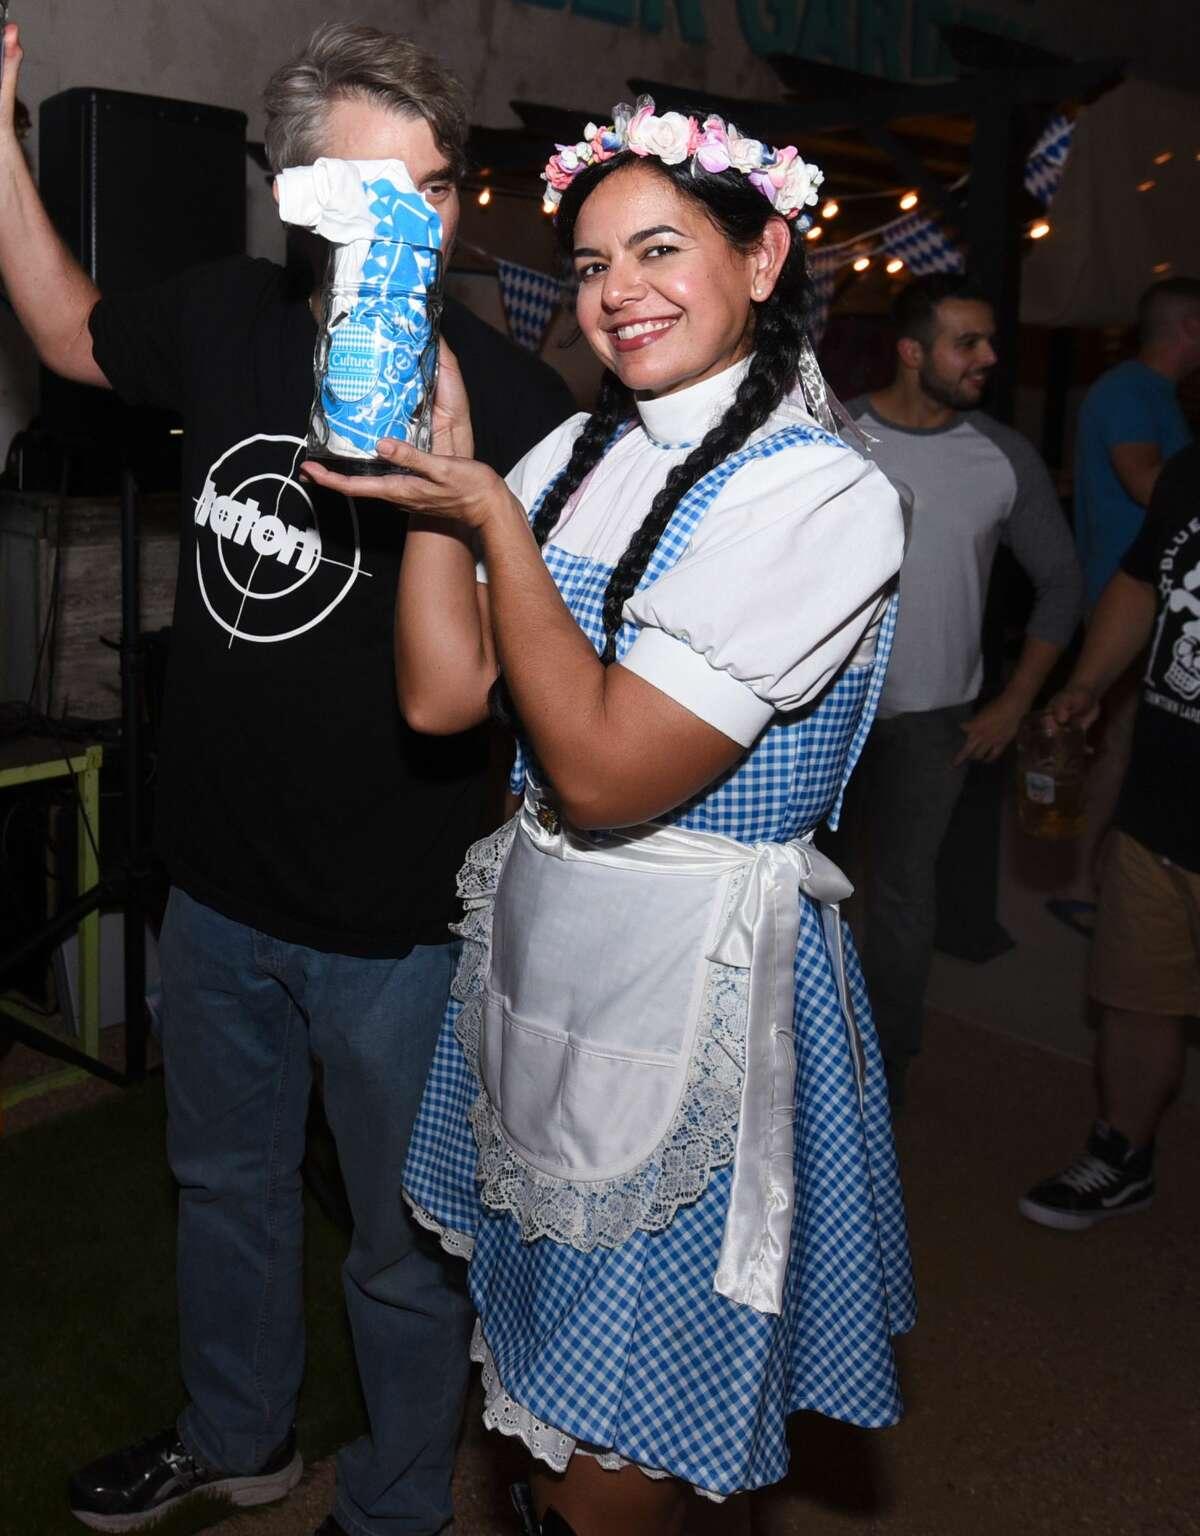 Cultura Beer Garden celebrates Oktoberfest, Saturday, Sep. 28, 2019.